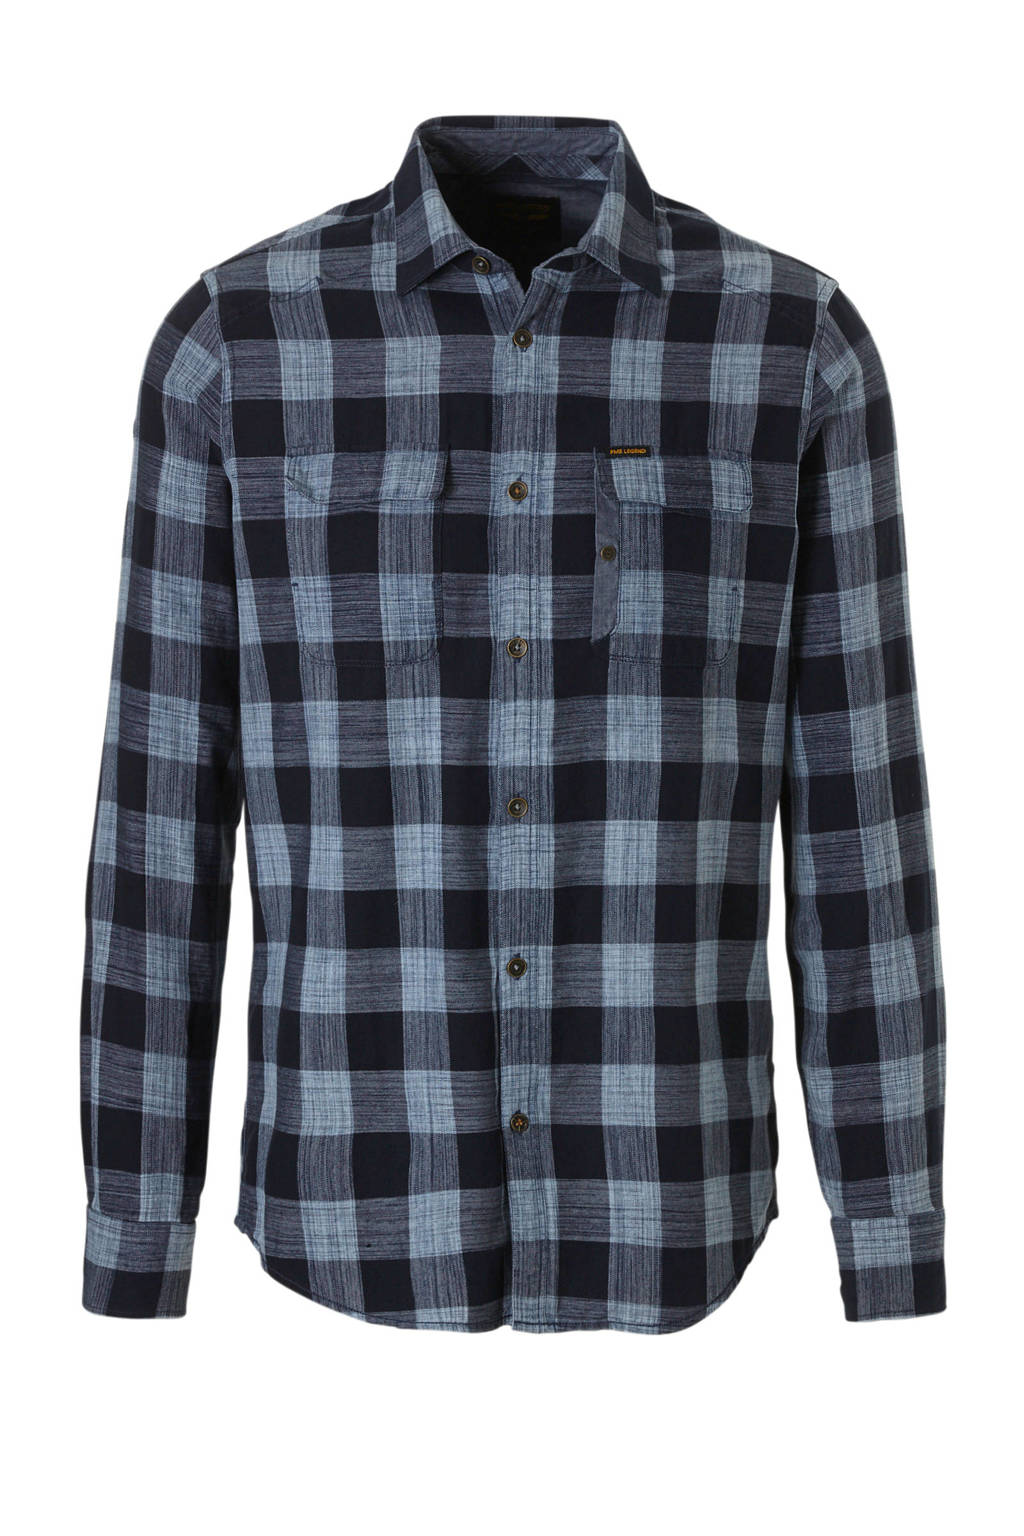 PME Legend overhemd, Grijs/blauw